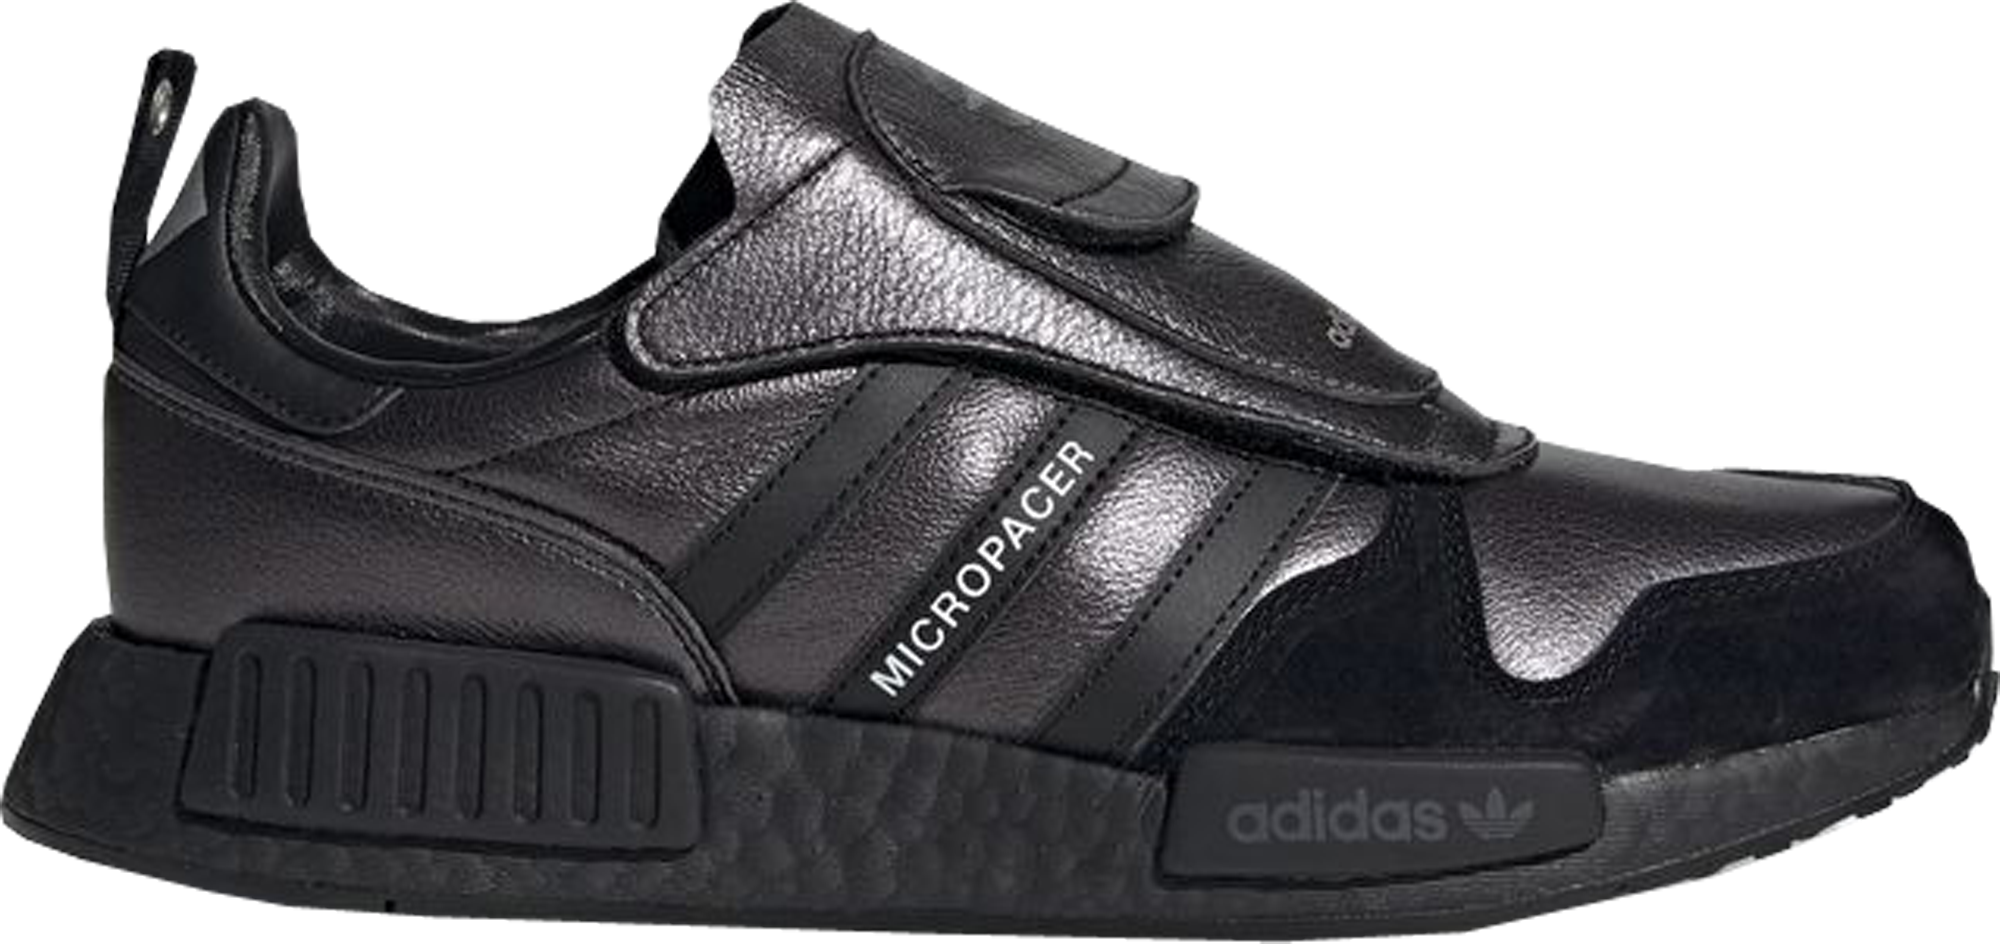 adidas Micropacer x R1 TfL Triple Black